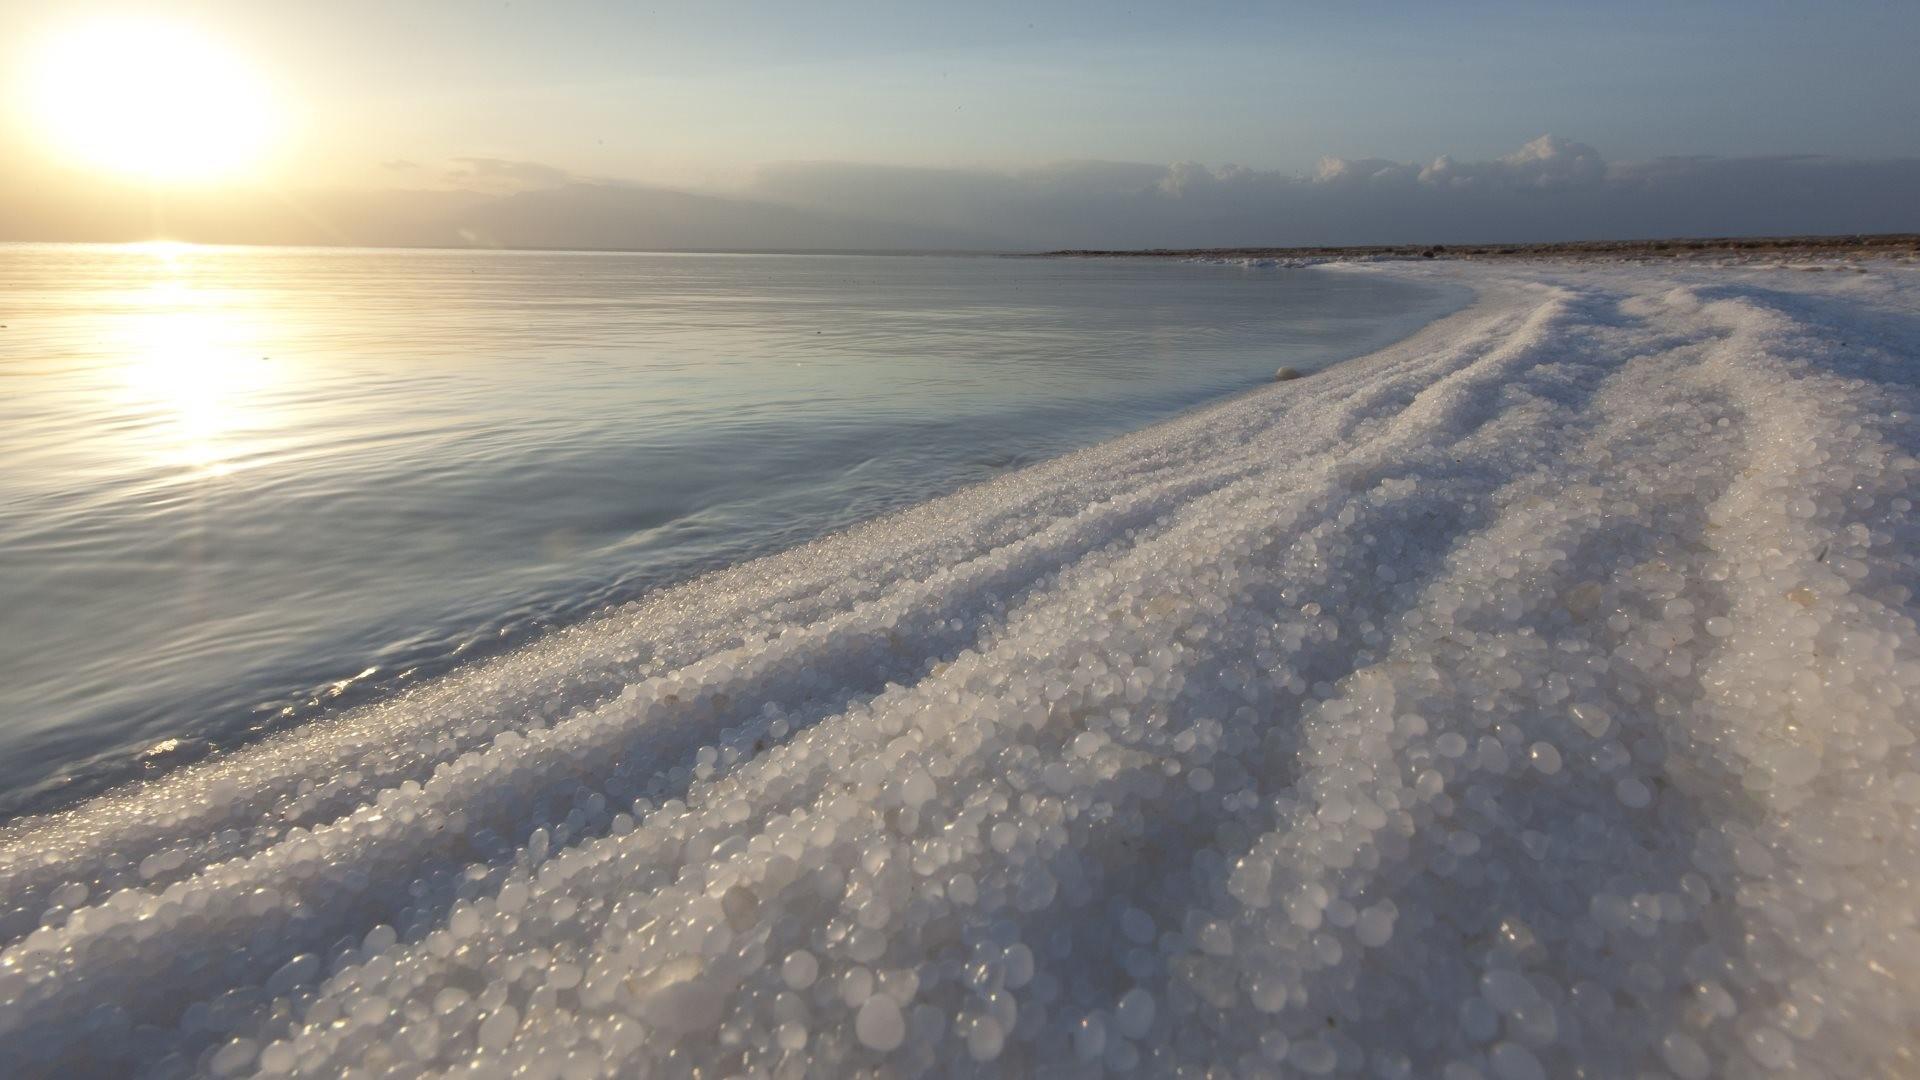 4K HD Wallpaper: Landscape and seascape from the Dead Sea